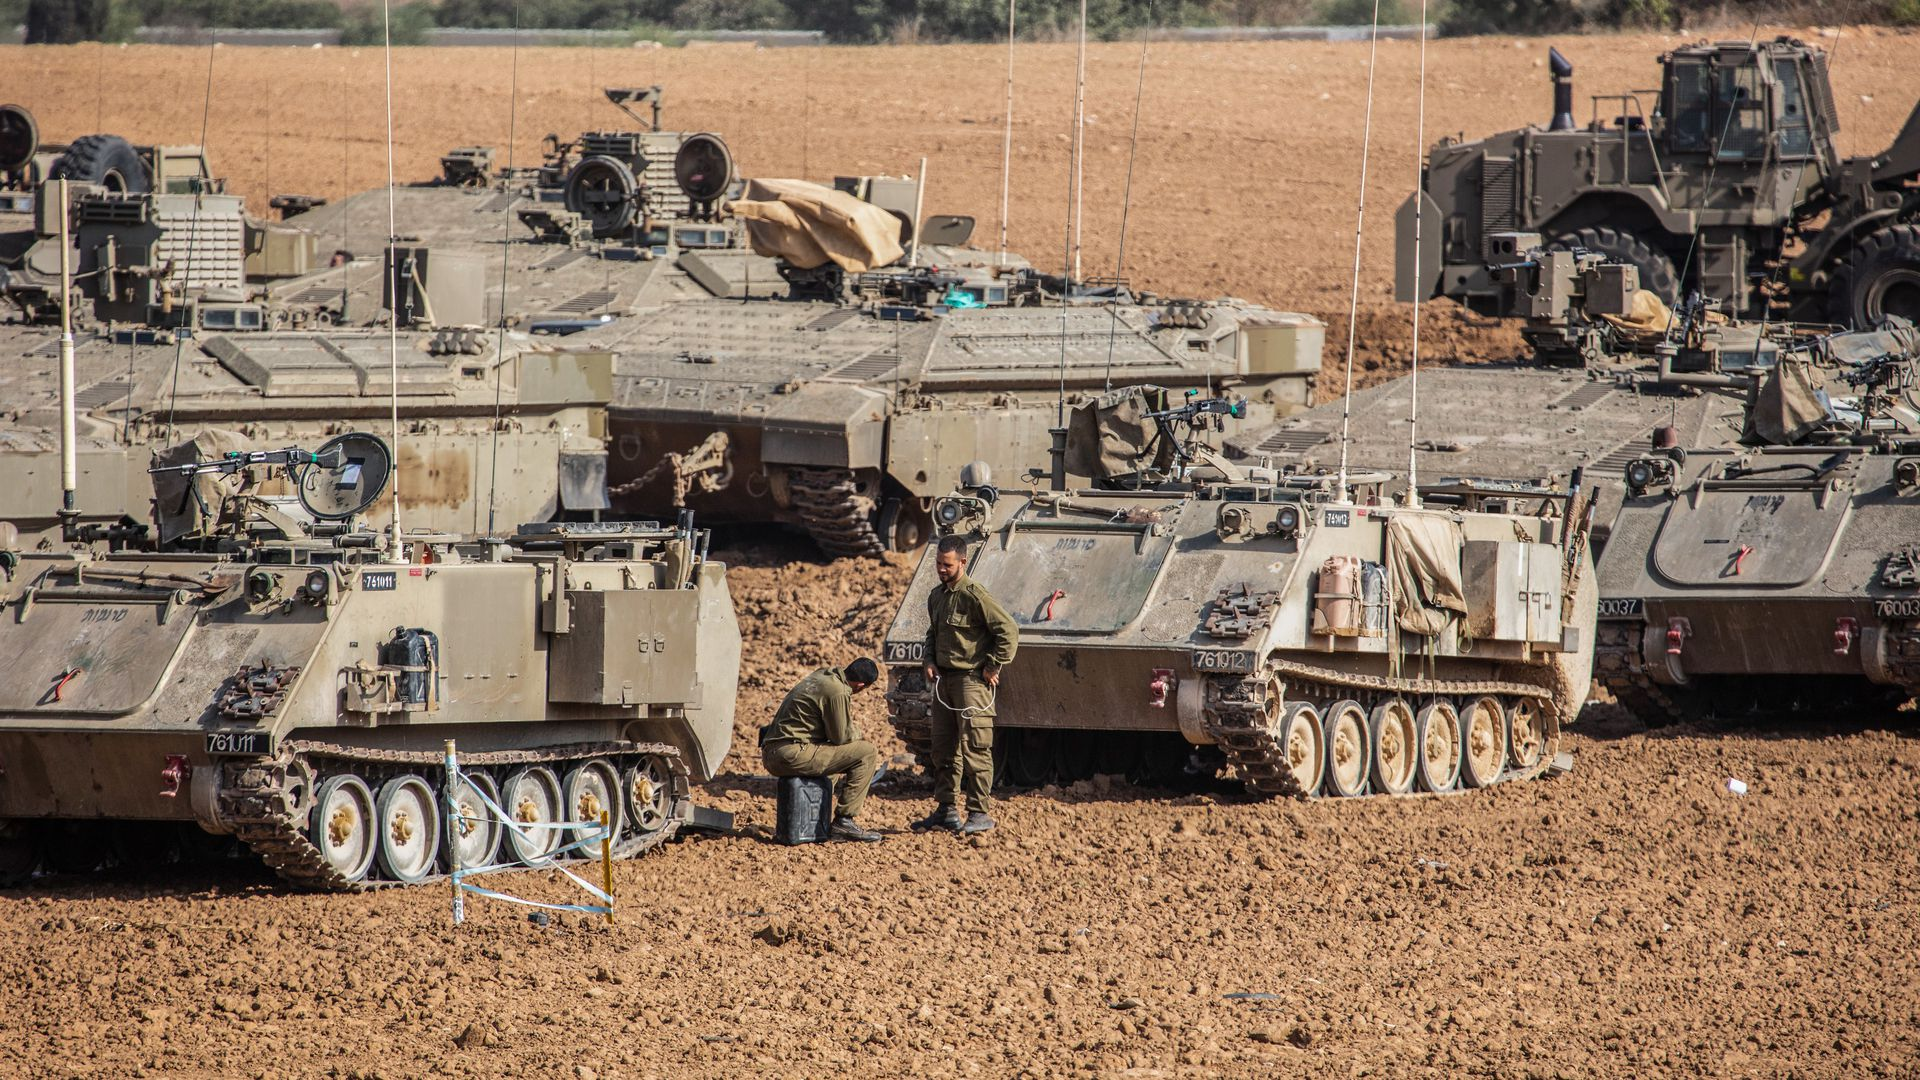 Israeli Defense Forces in the Gaza strip